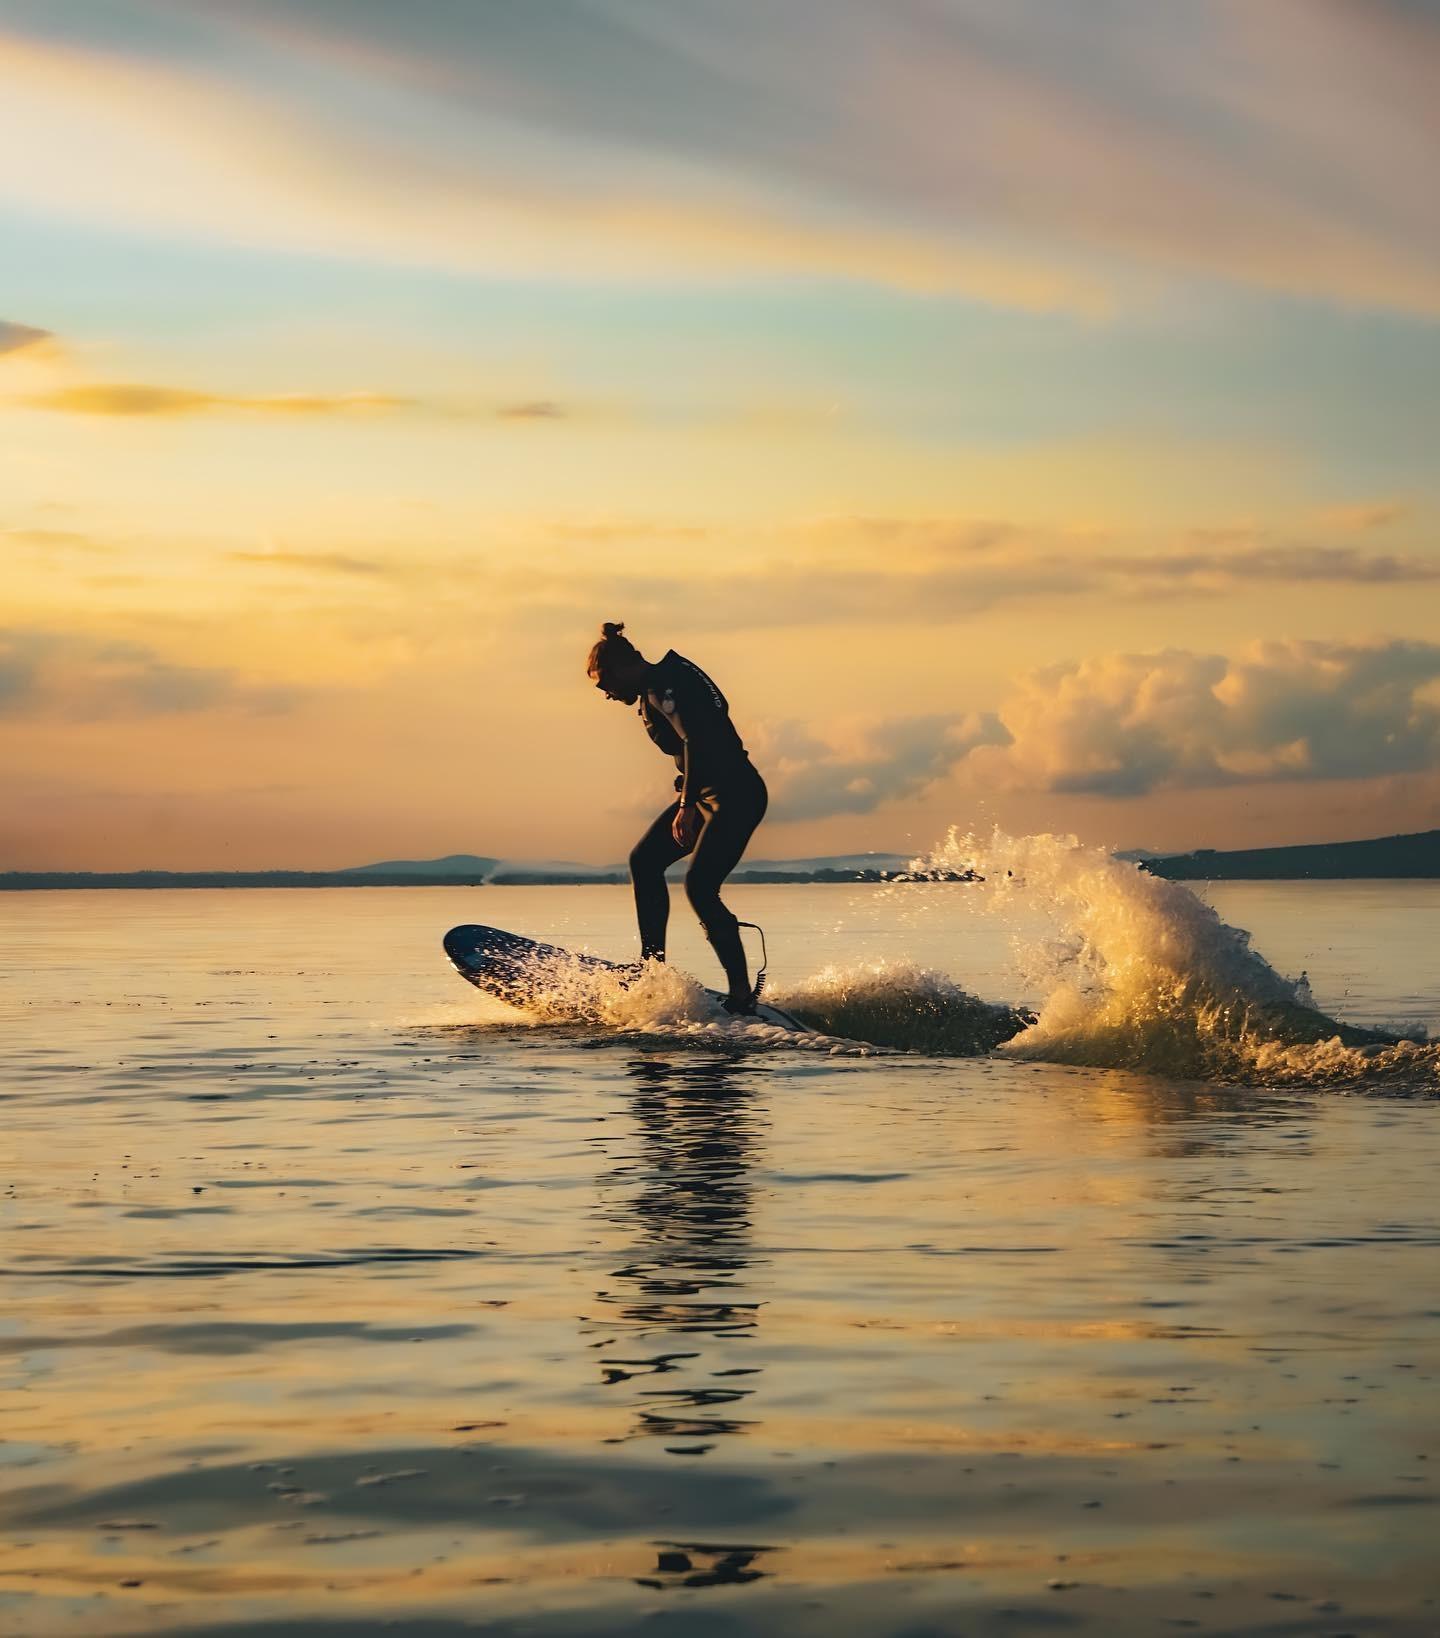 Luxury sports: da YouTube al Trasimeno sul Jetboard